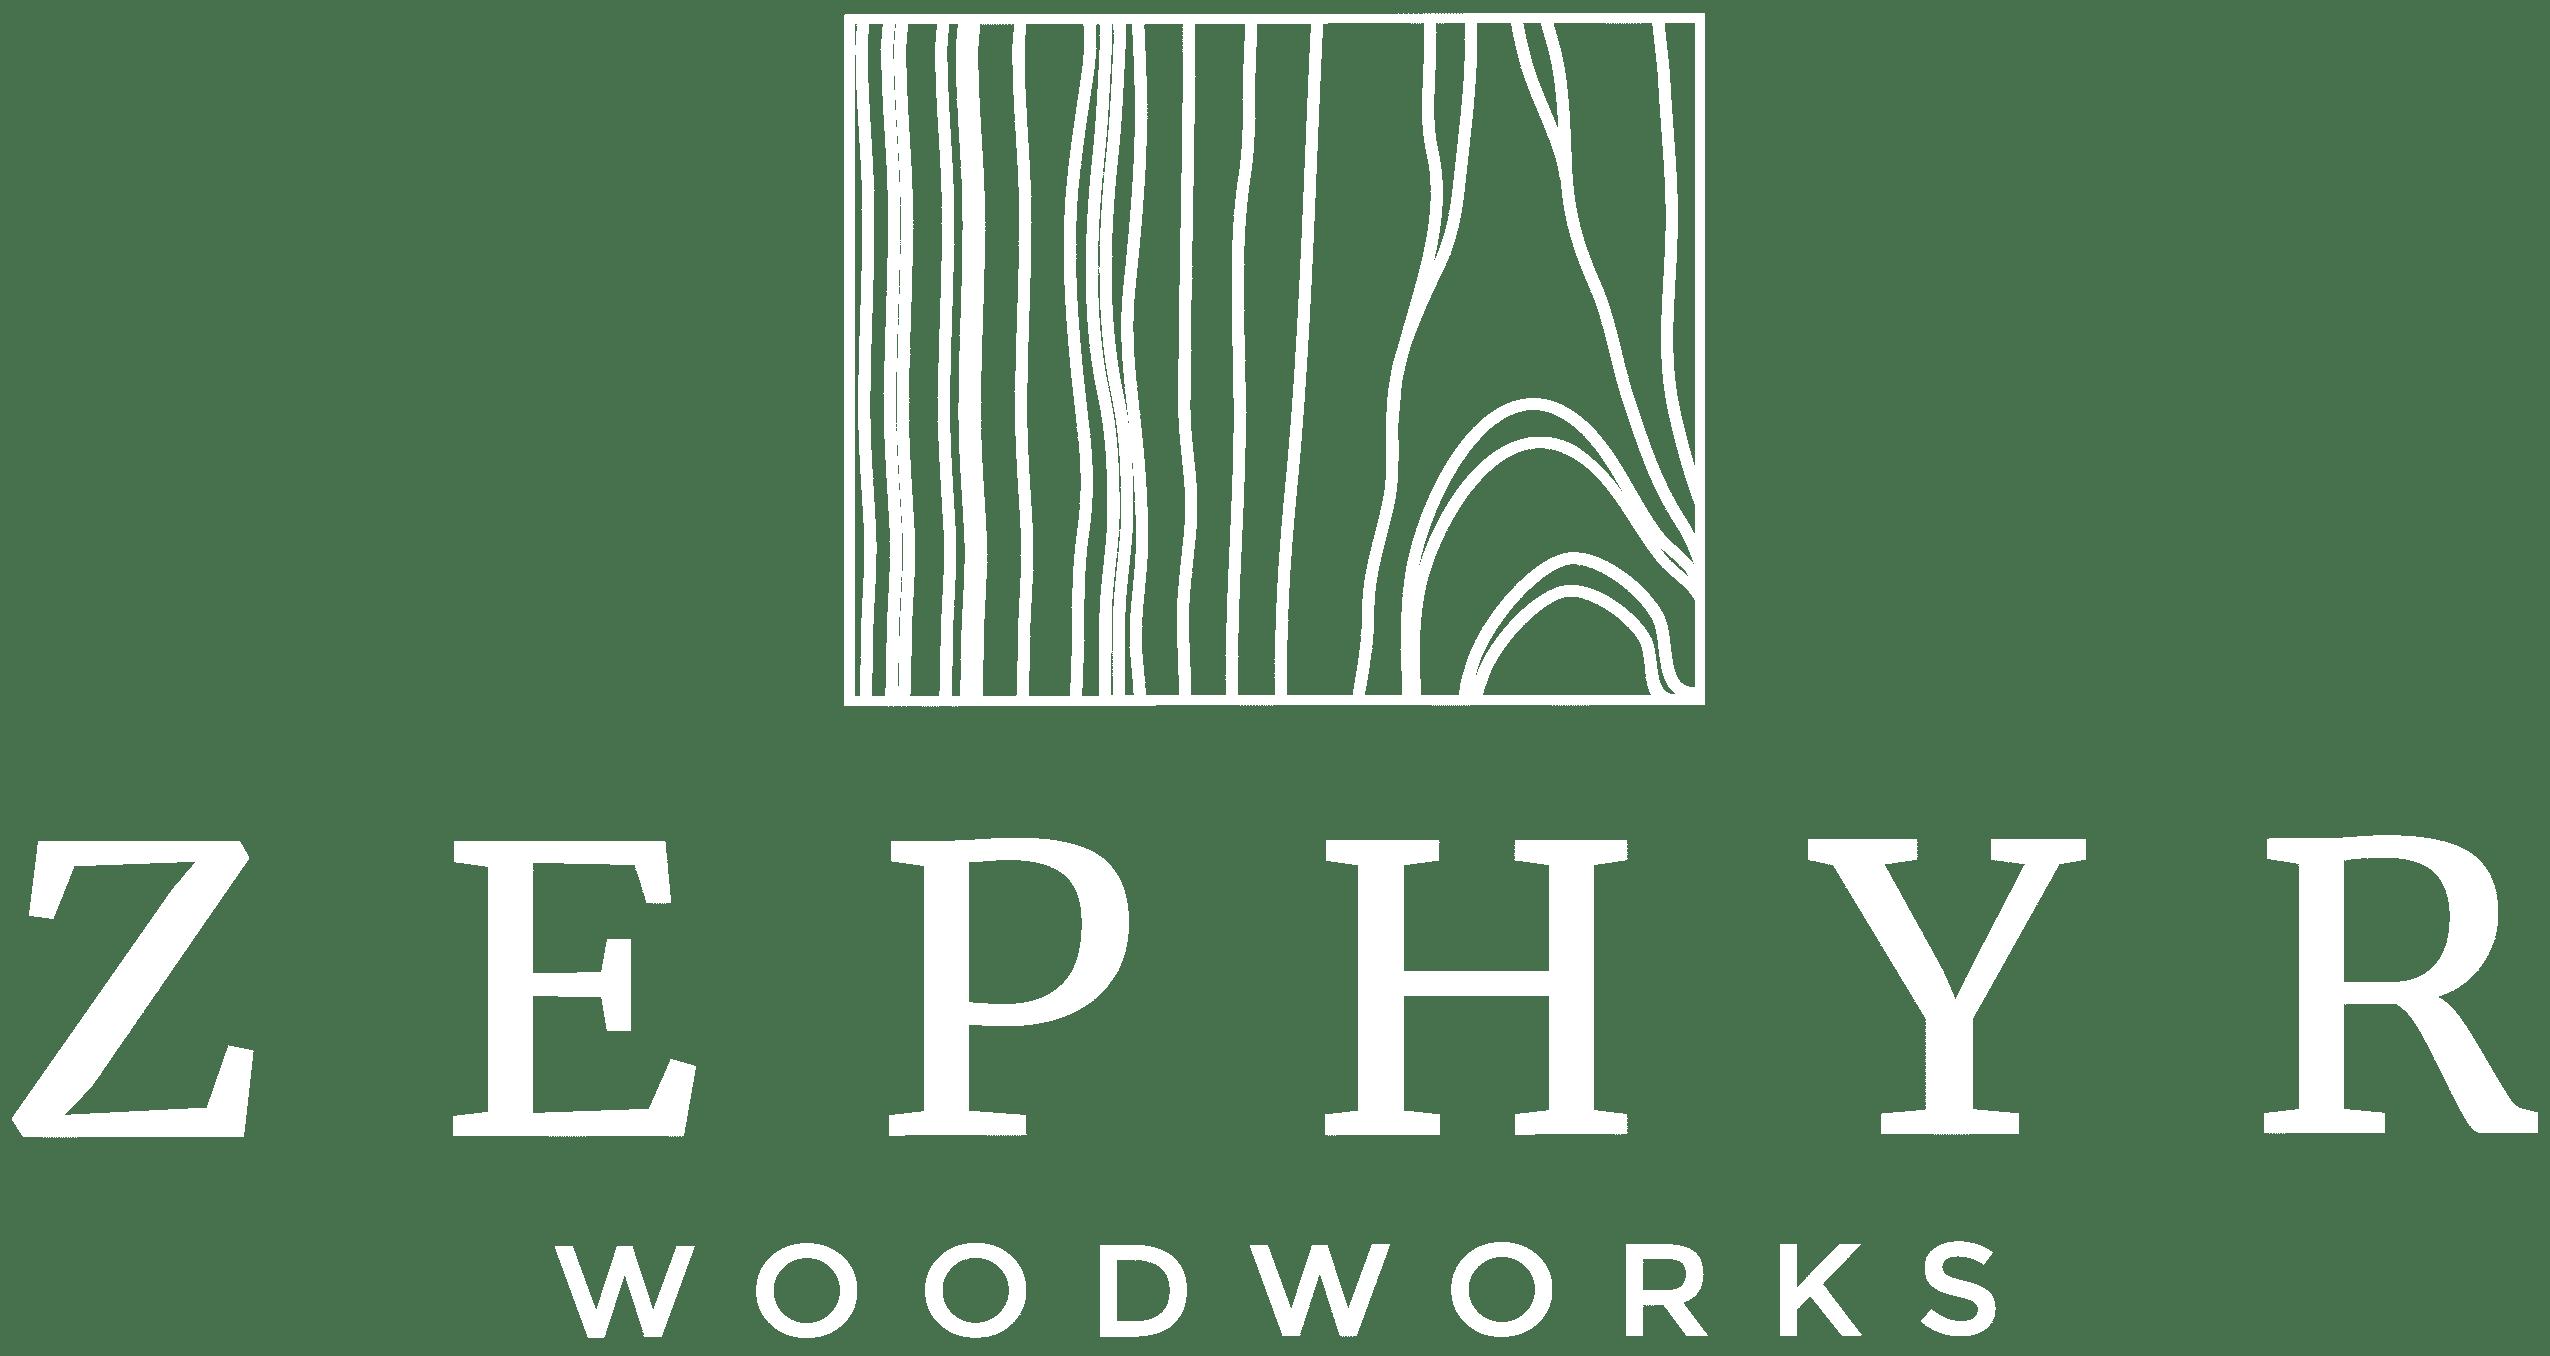 Zephyr Woodworks